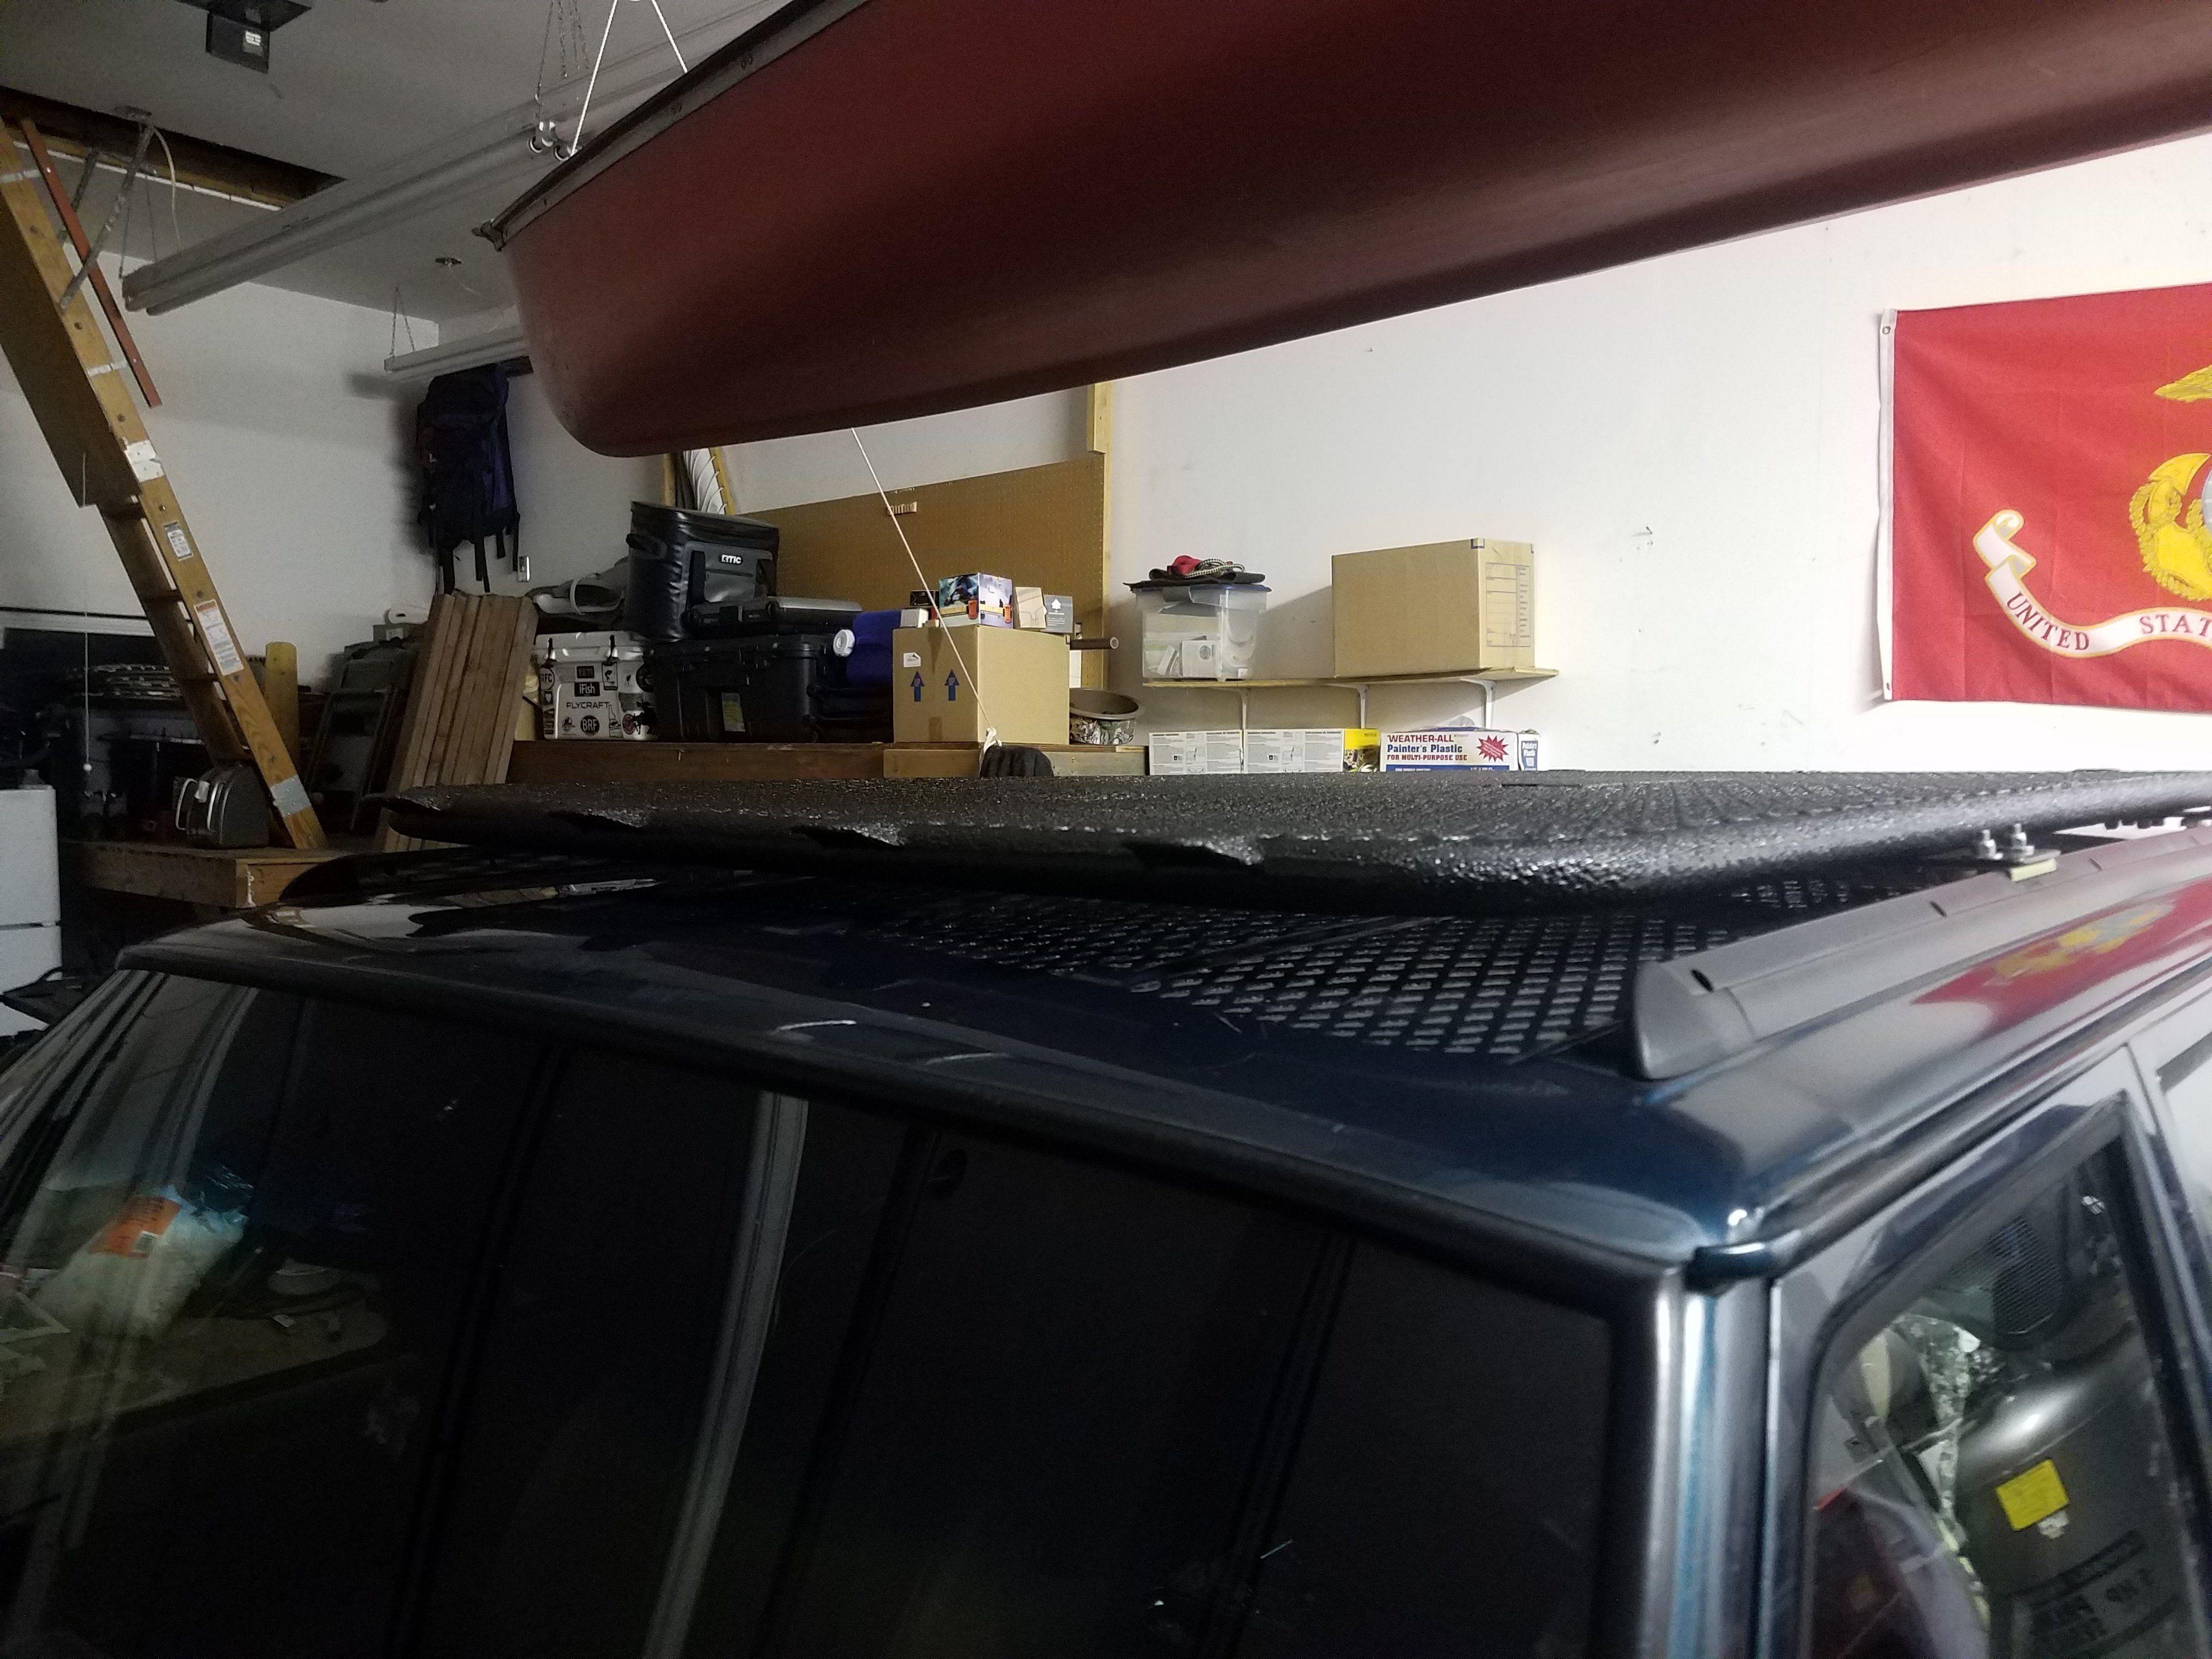 Jeep Cherokee Xj Platform Roof Rack Jeep Cherokee Roof Rack